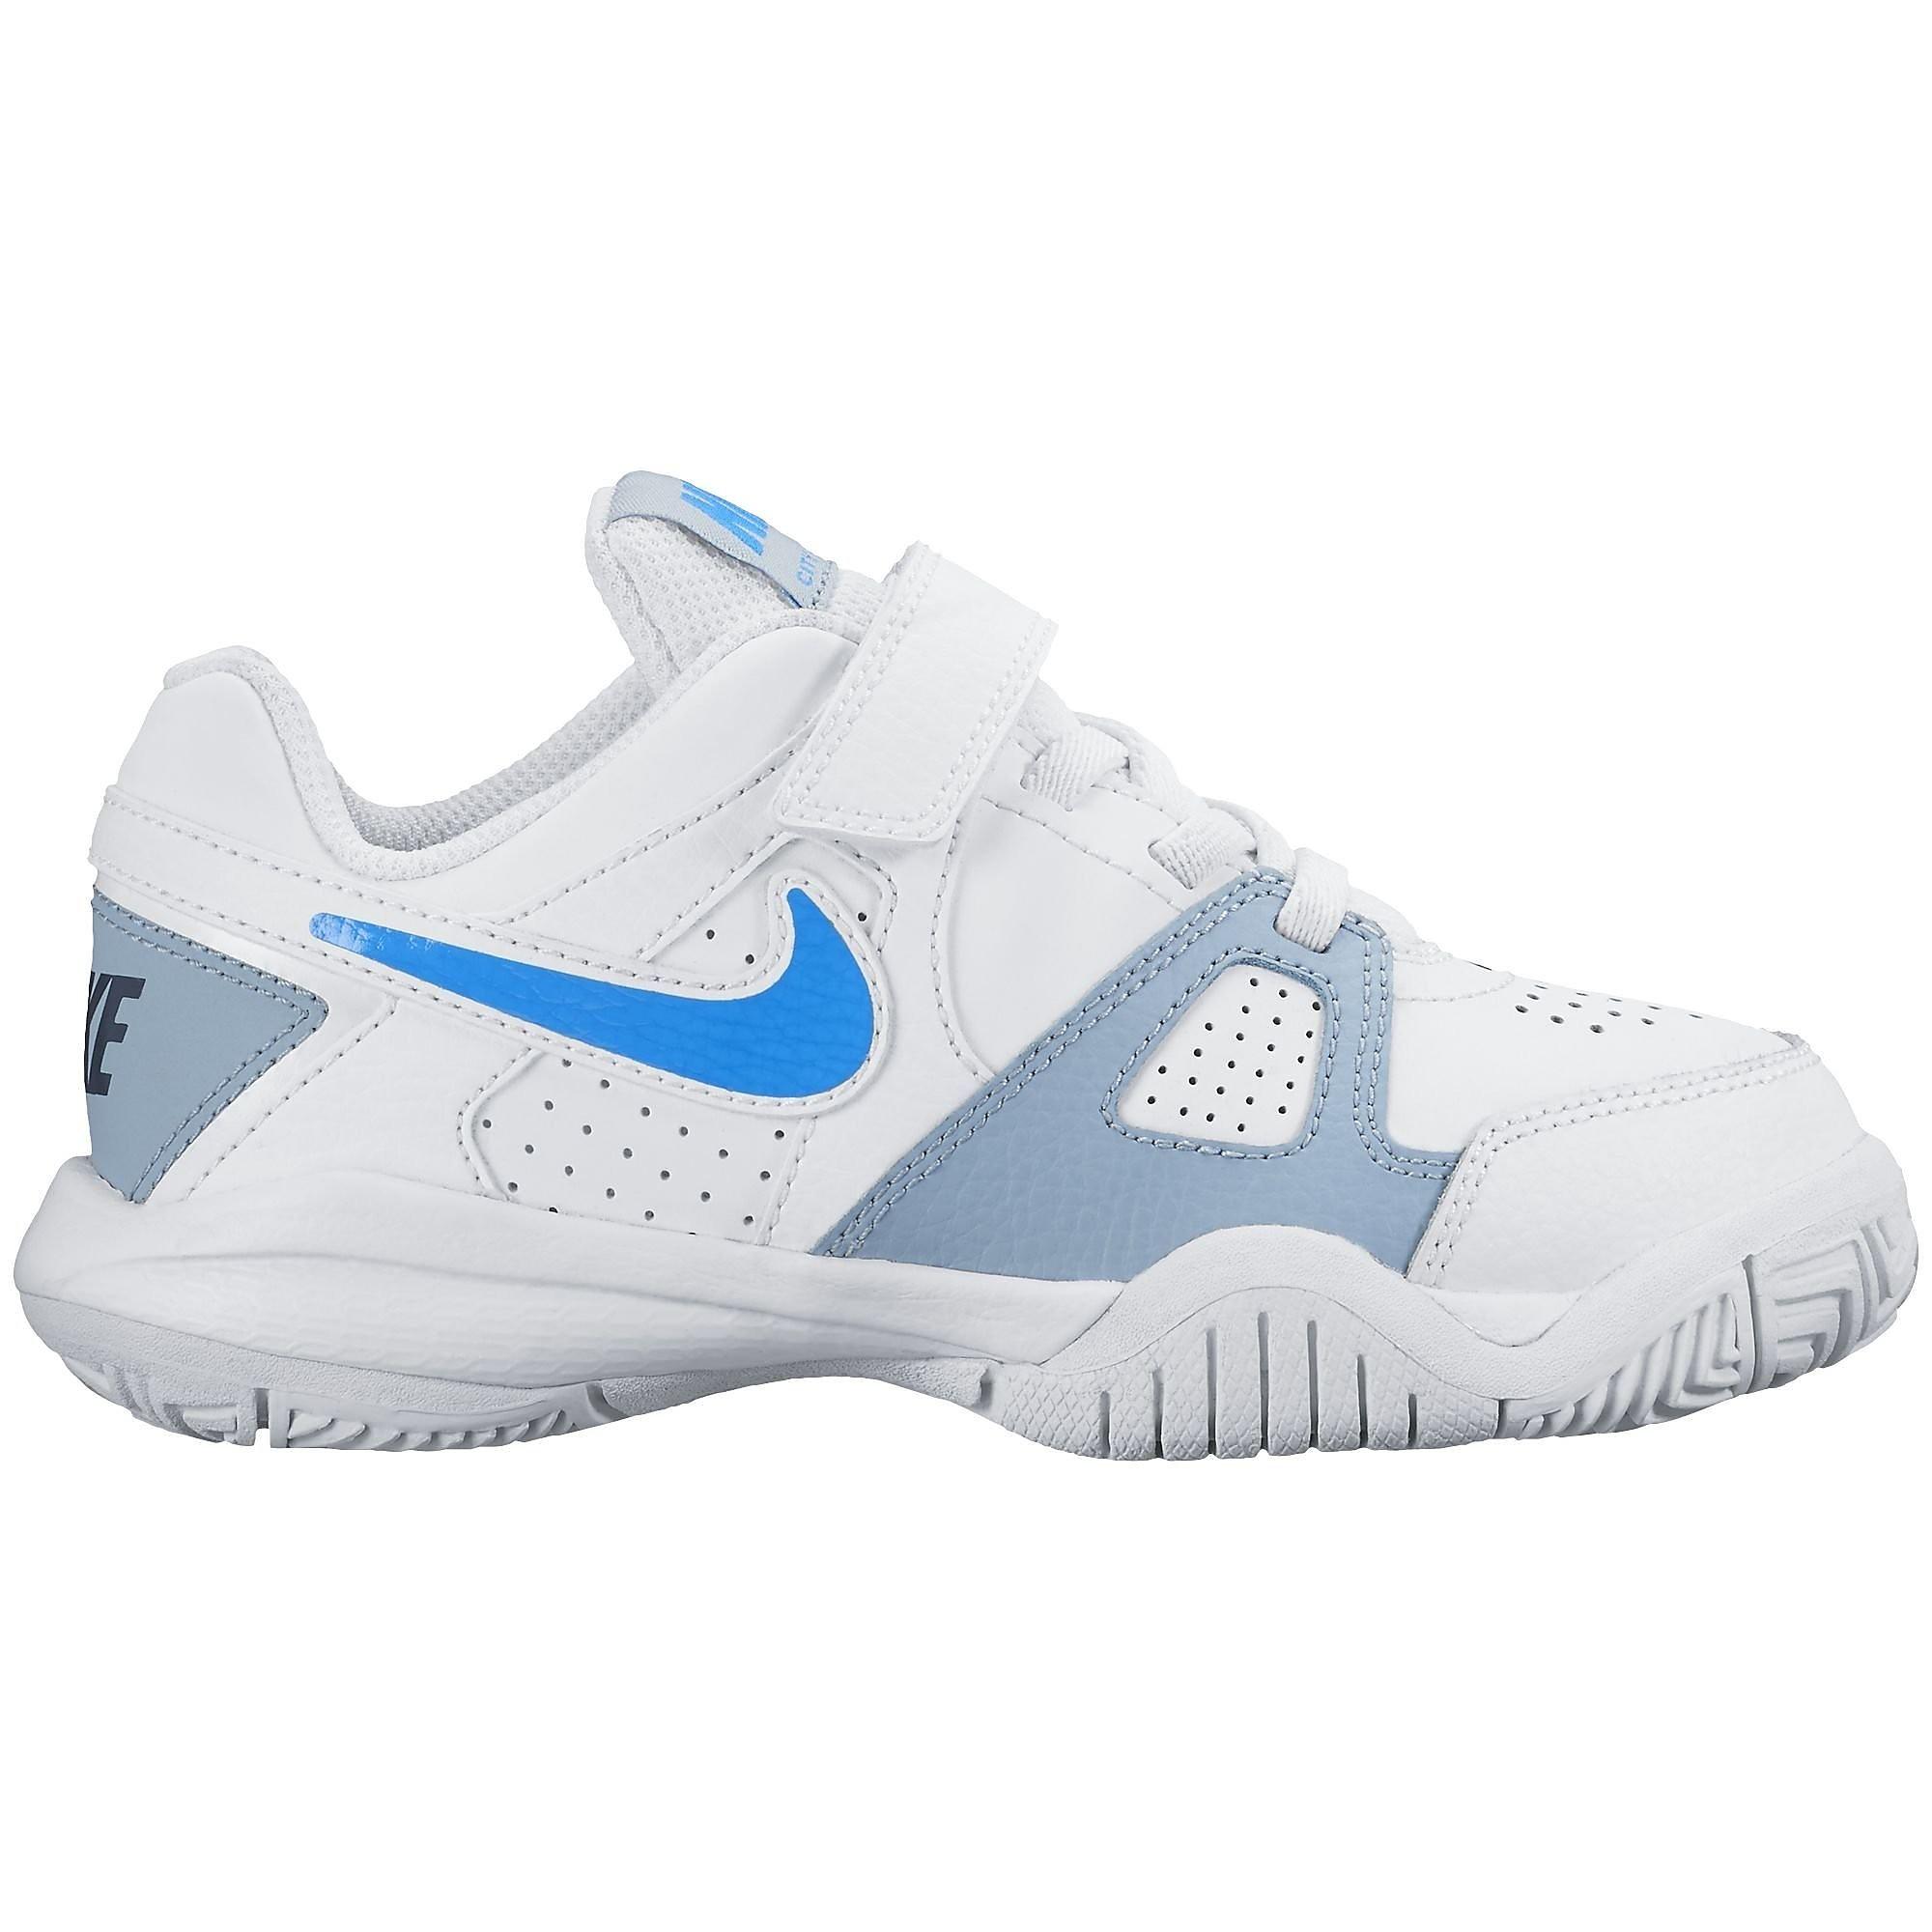 Nike CITY COURT 7